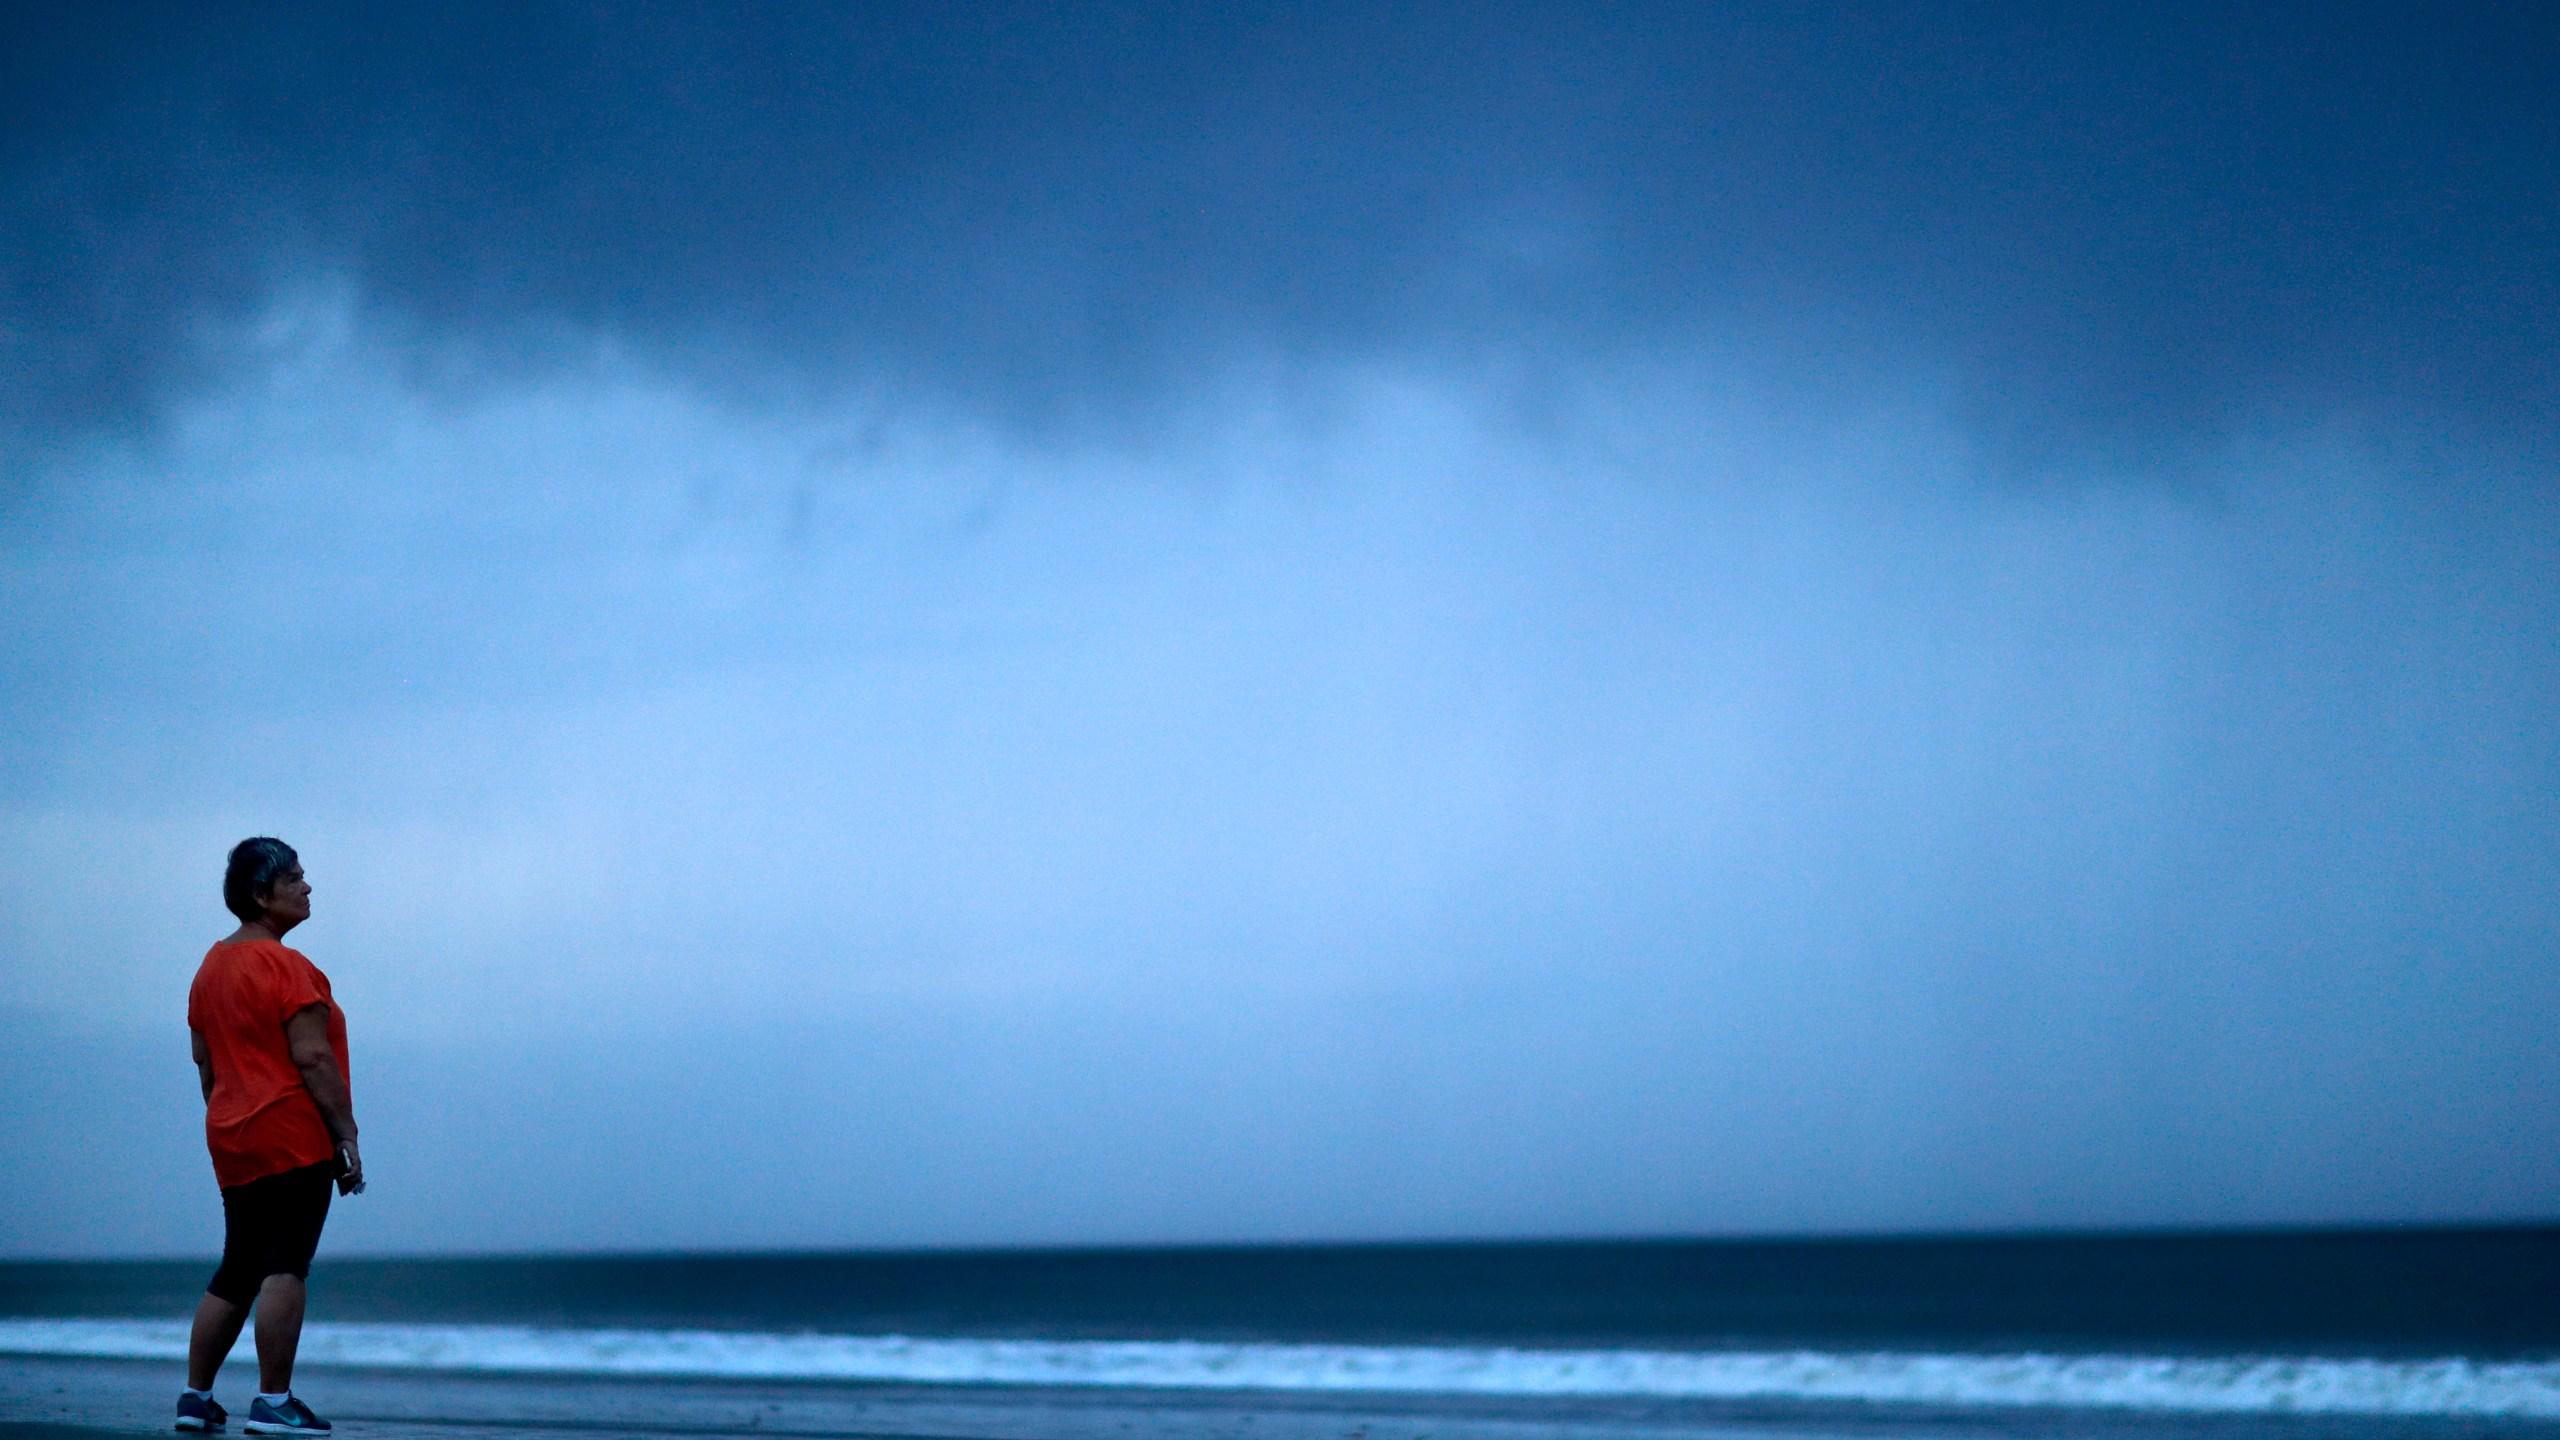 Tropical_Weather_South_Carolina_47488-159532.jpg47451663